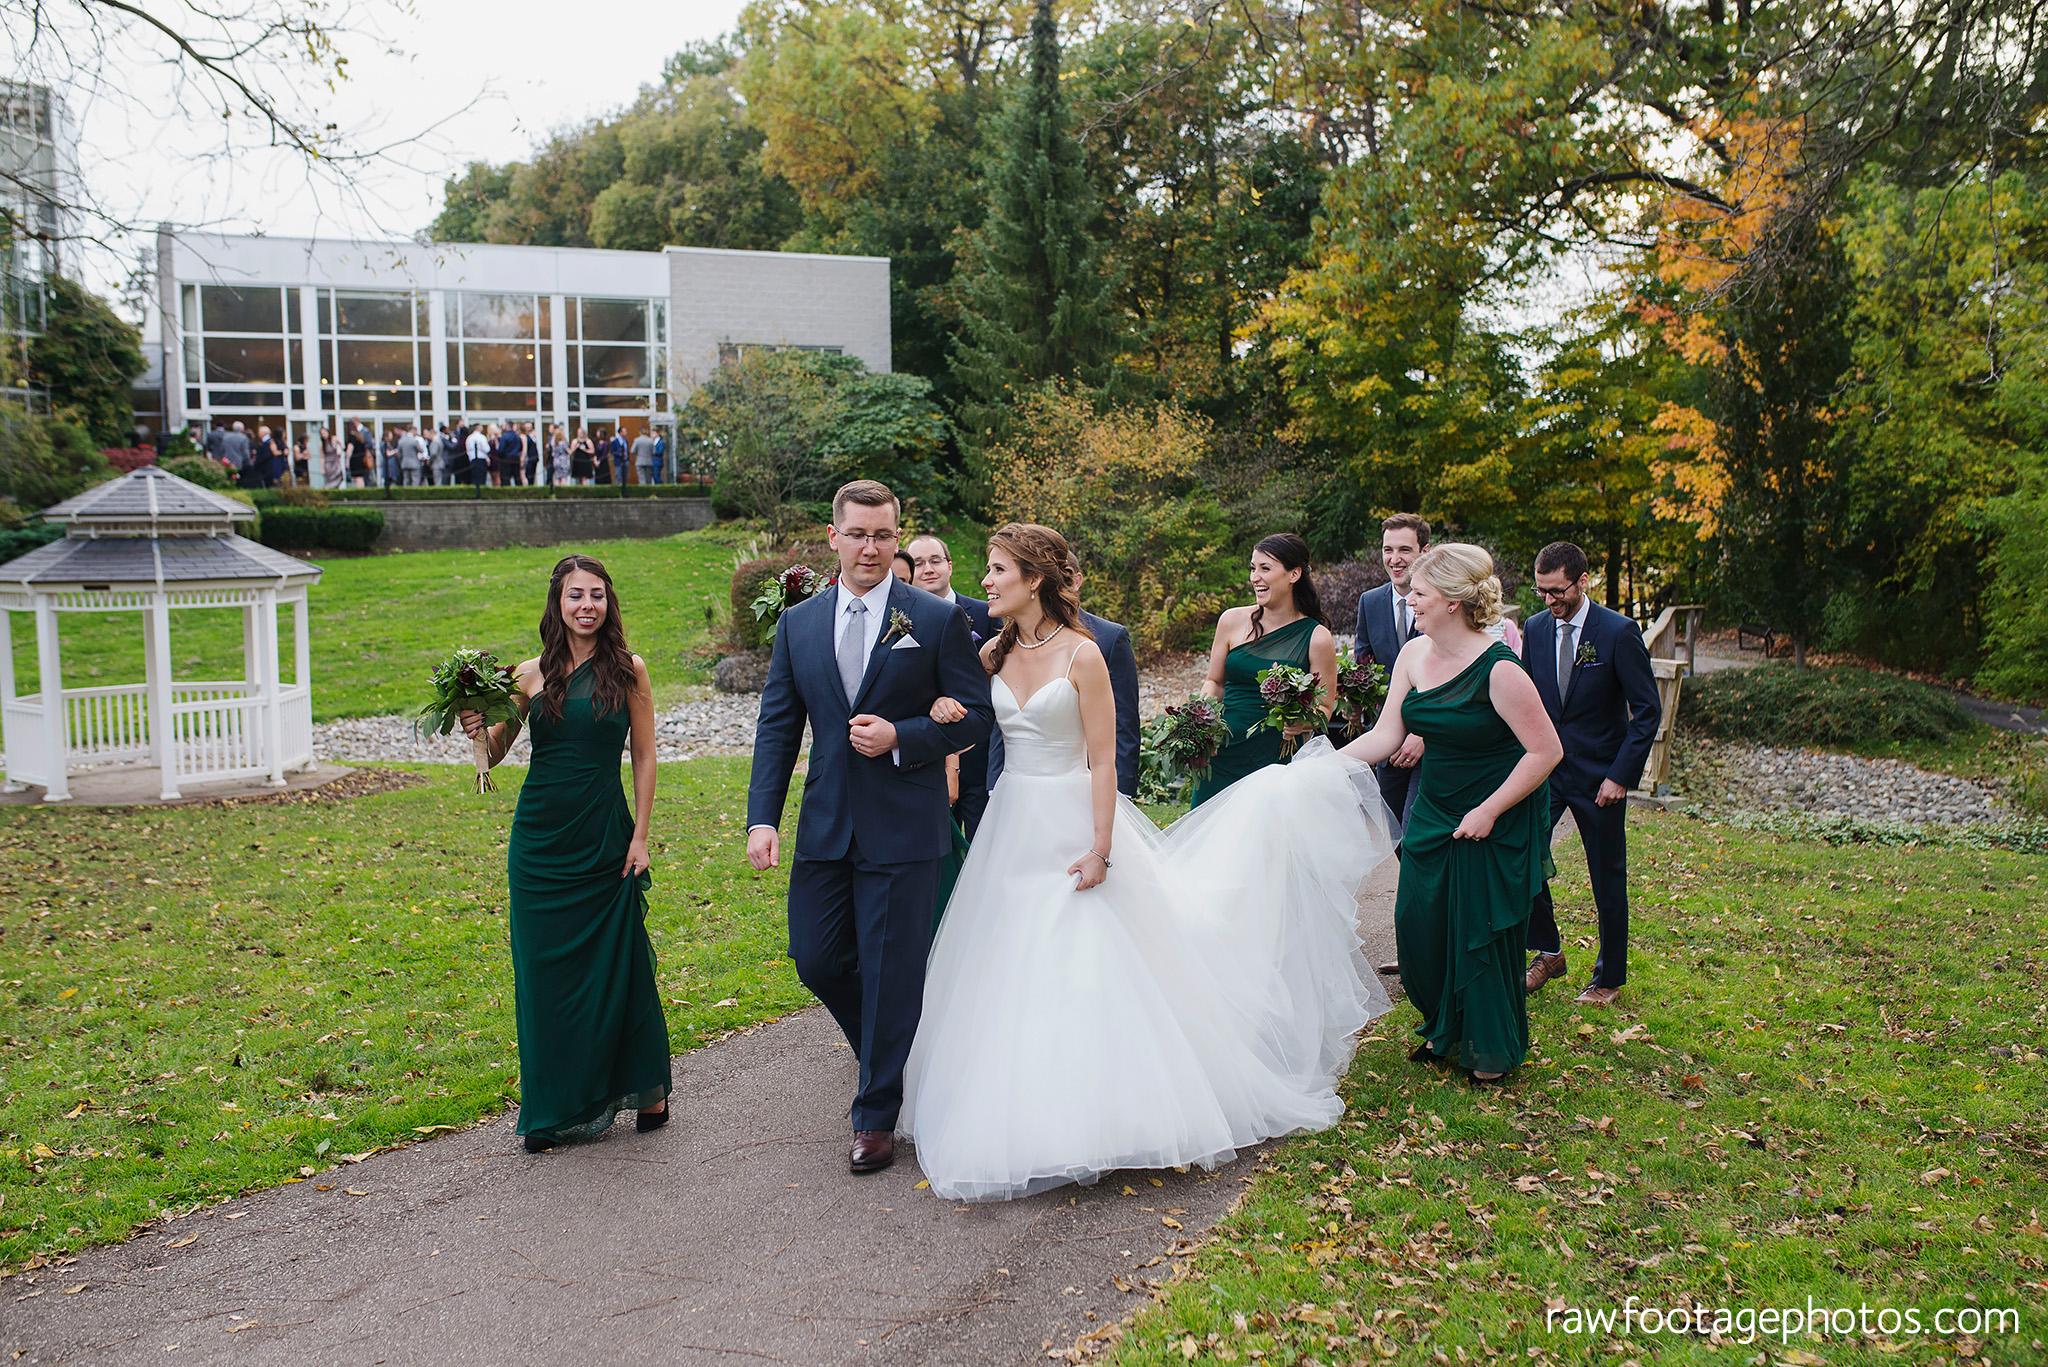 london_ontario_wedding_photographer-civic_gardens-springbank_park-succulent_bouquet-fall_wedding-bridge-raw_footage_photography050.jpg